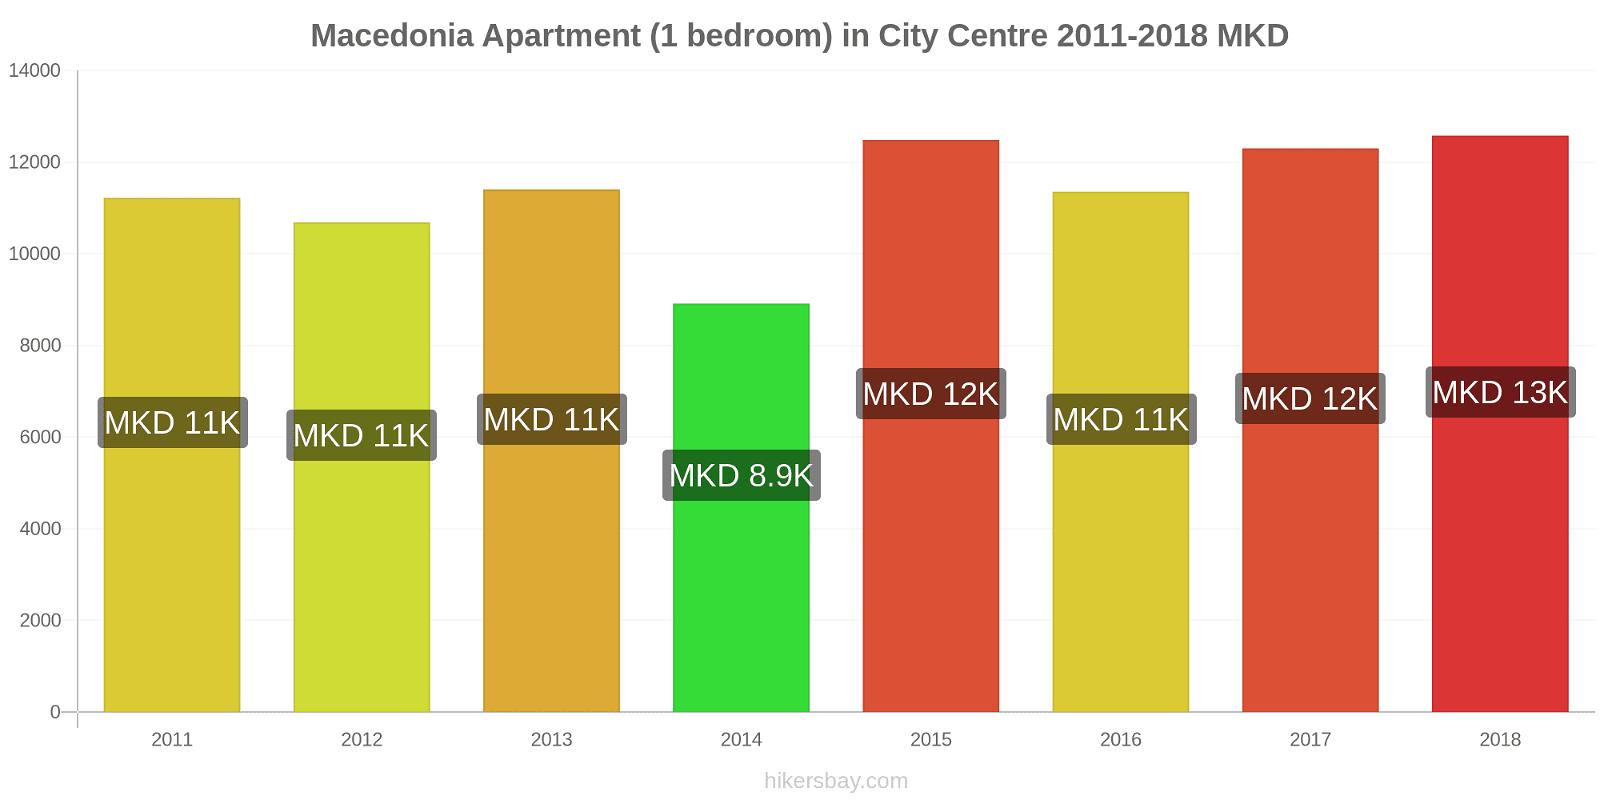 Macedonia price changes Apartment (1 bedroom) in City Centre hikersbay.com